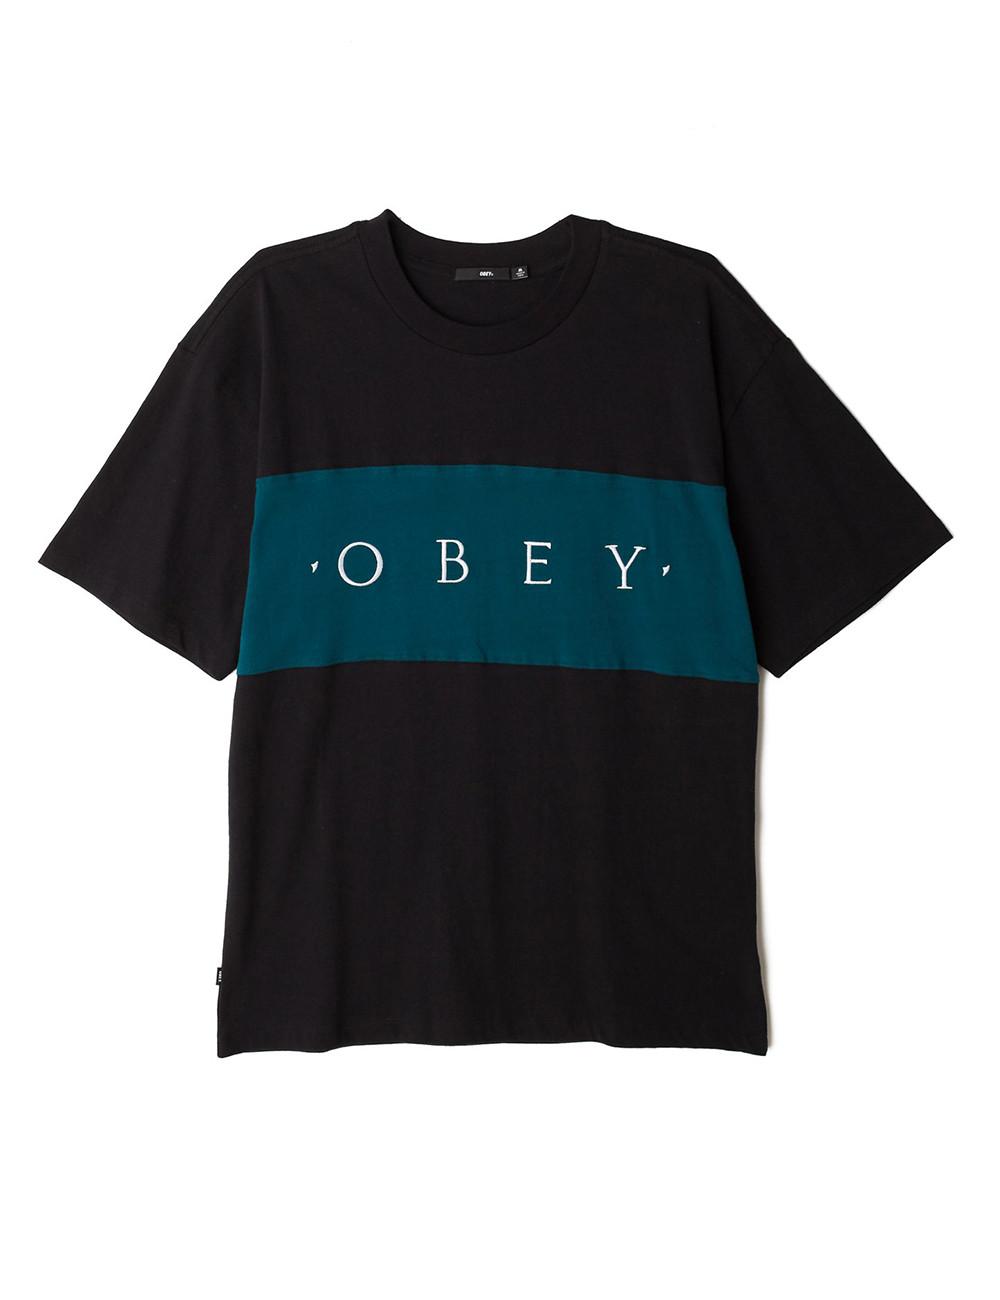 Obey Conrad classic tee - 131080252 | Shapestore.it